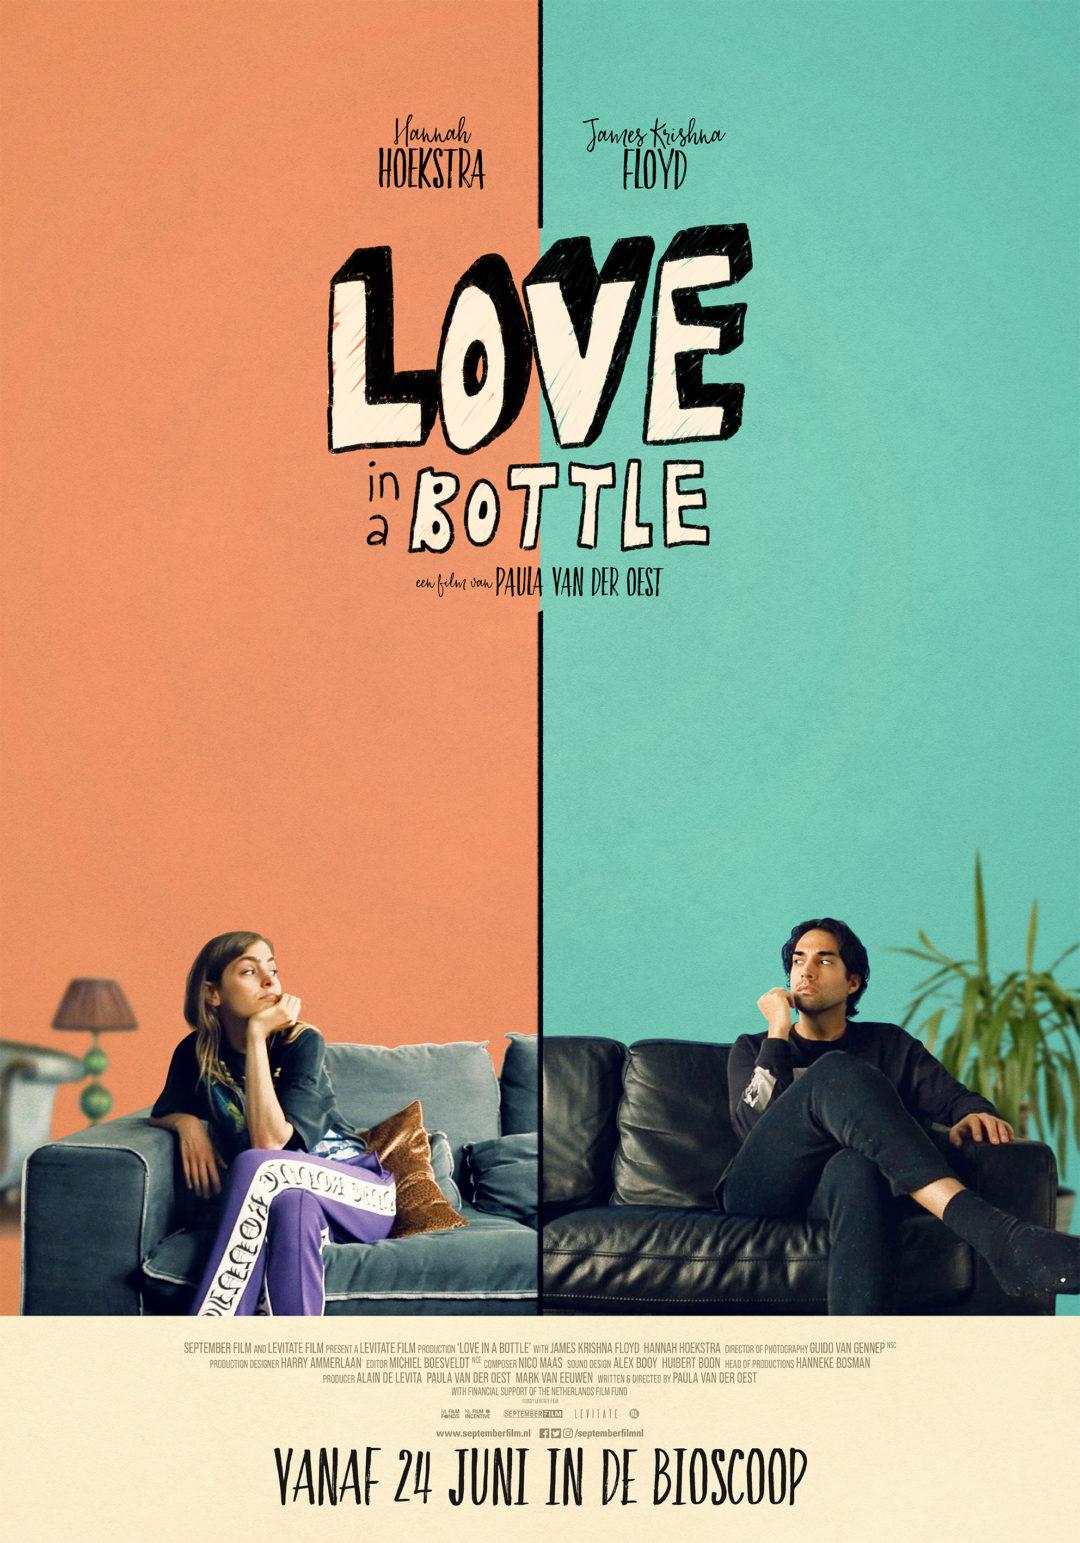 Love-in-a-Bottle_ps_1_jpg_sd-high_Cameraman-Guido-van-Gennep-Producent-Levitate-Film.jpg